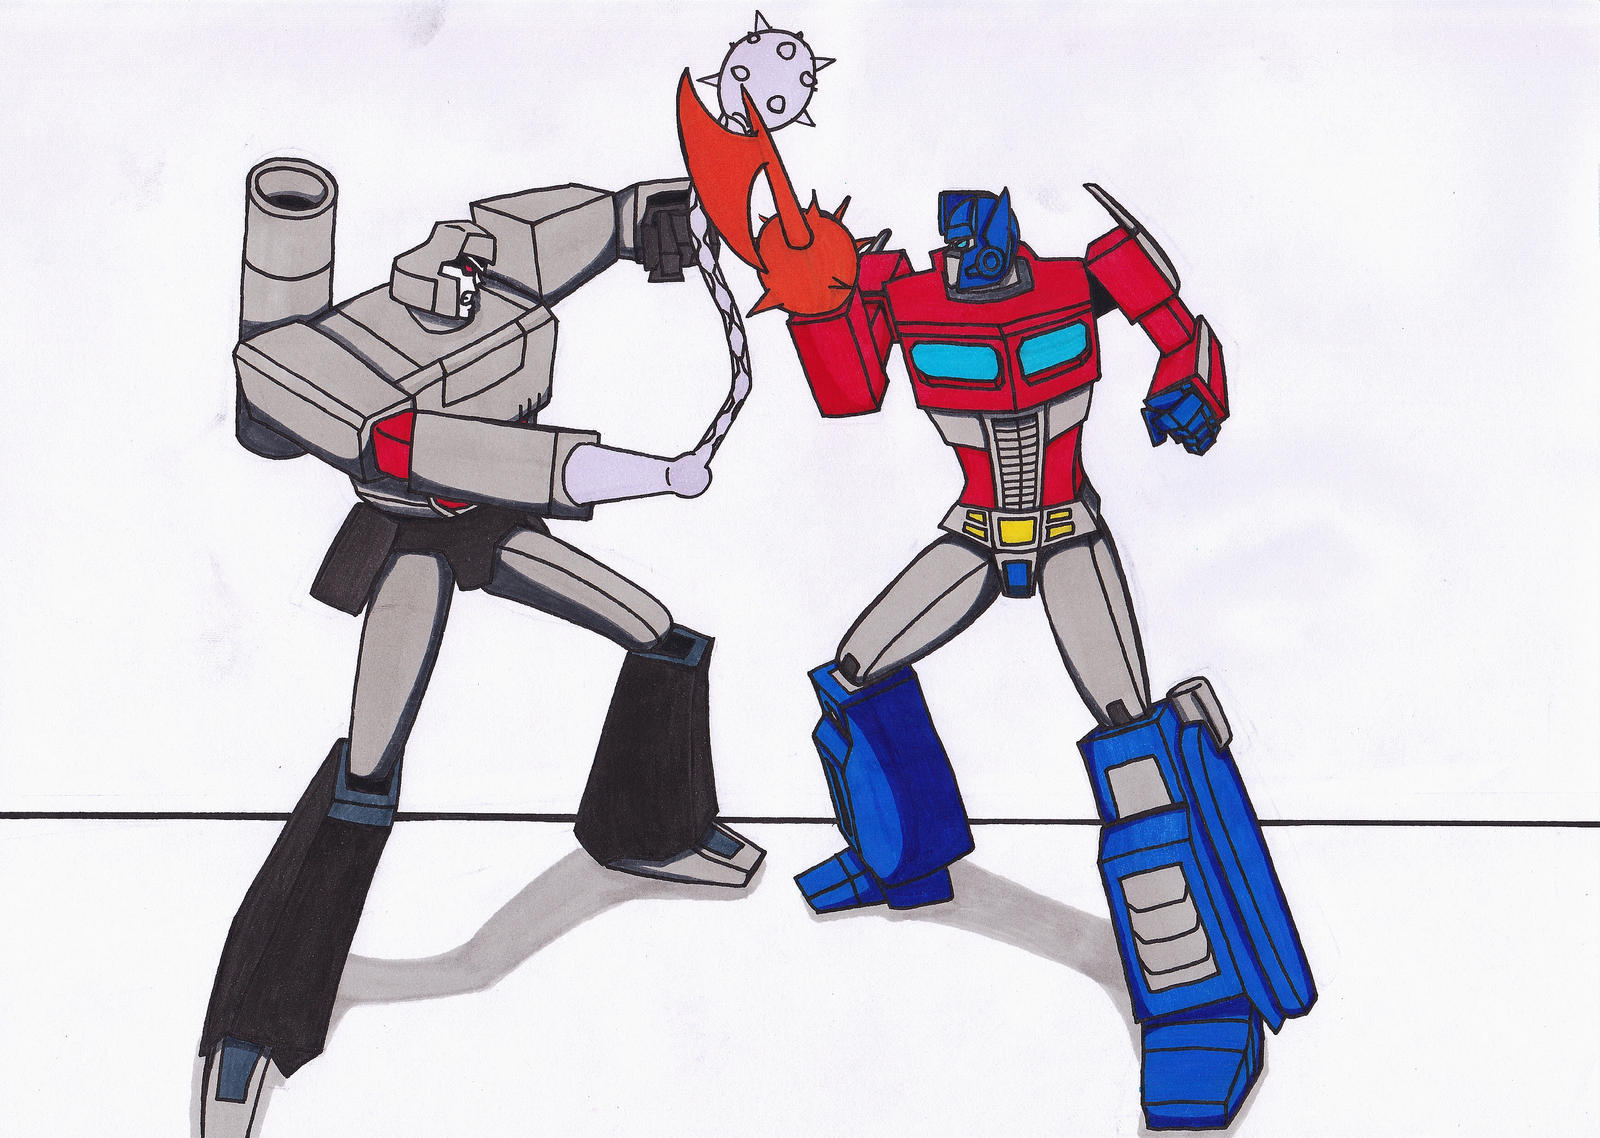 Optimus Prime vs Megatron by KillerTeddyBear94 on DeviantArt